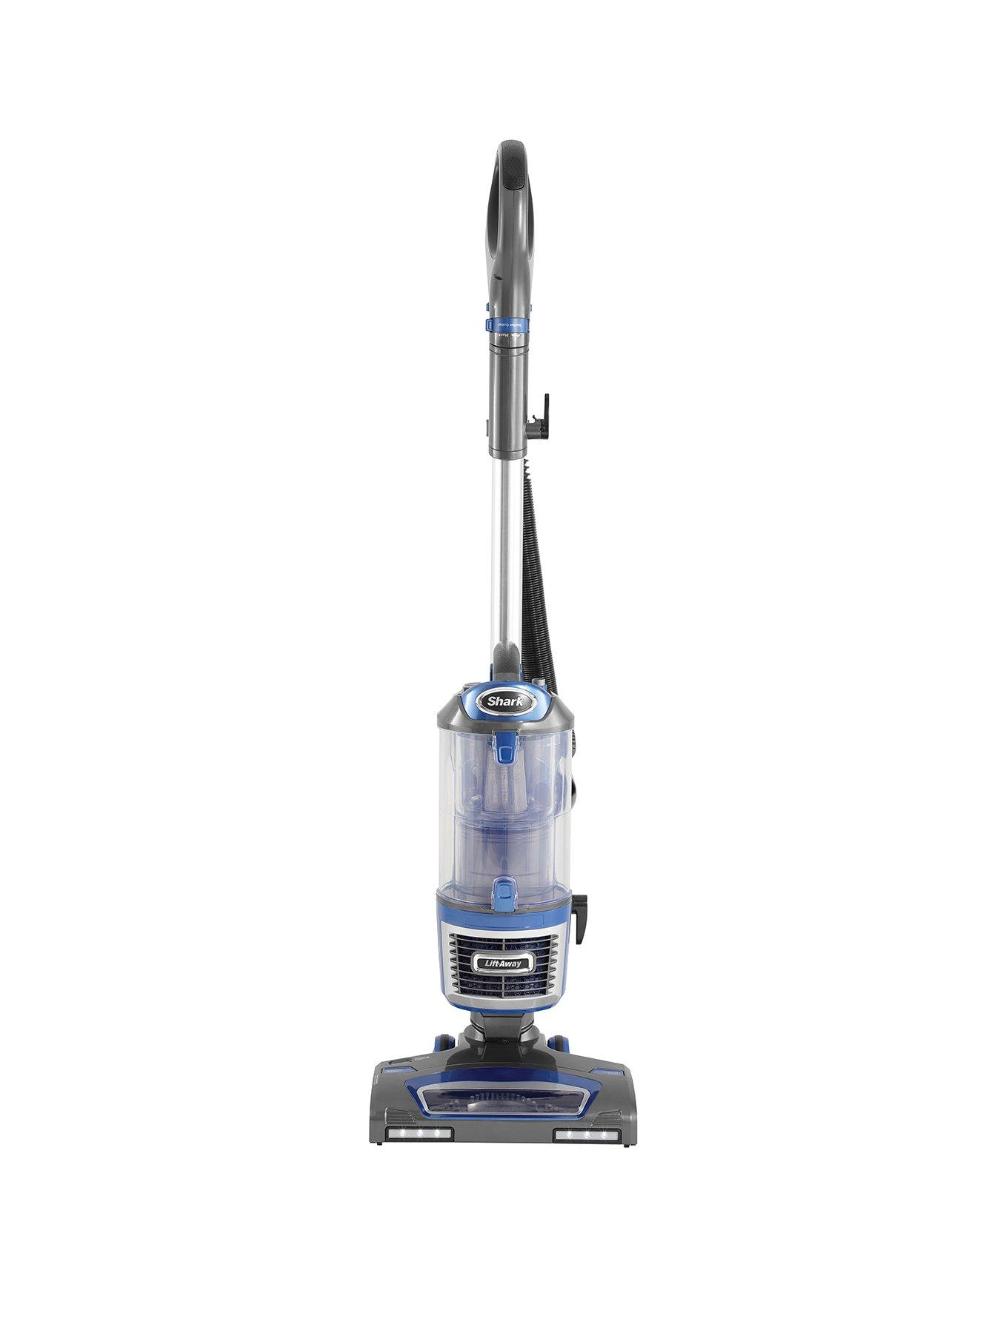 LiftAway Upright Vacuum NV601UK in 2020 Upright vacuums